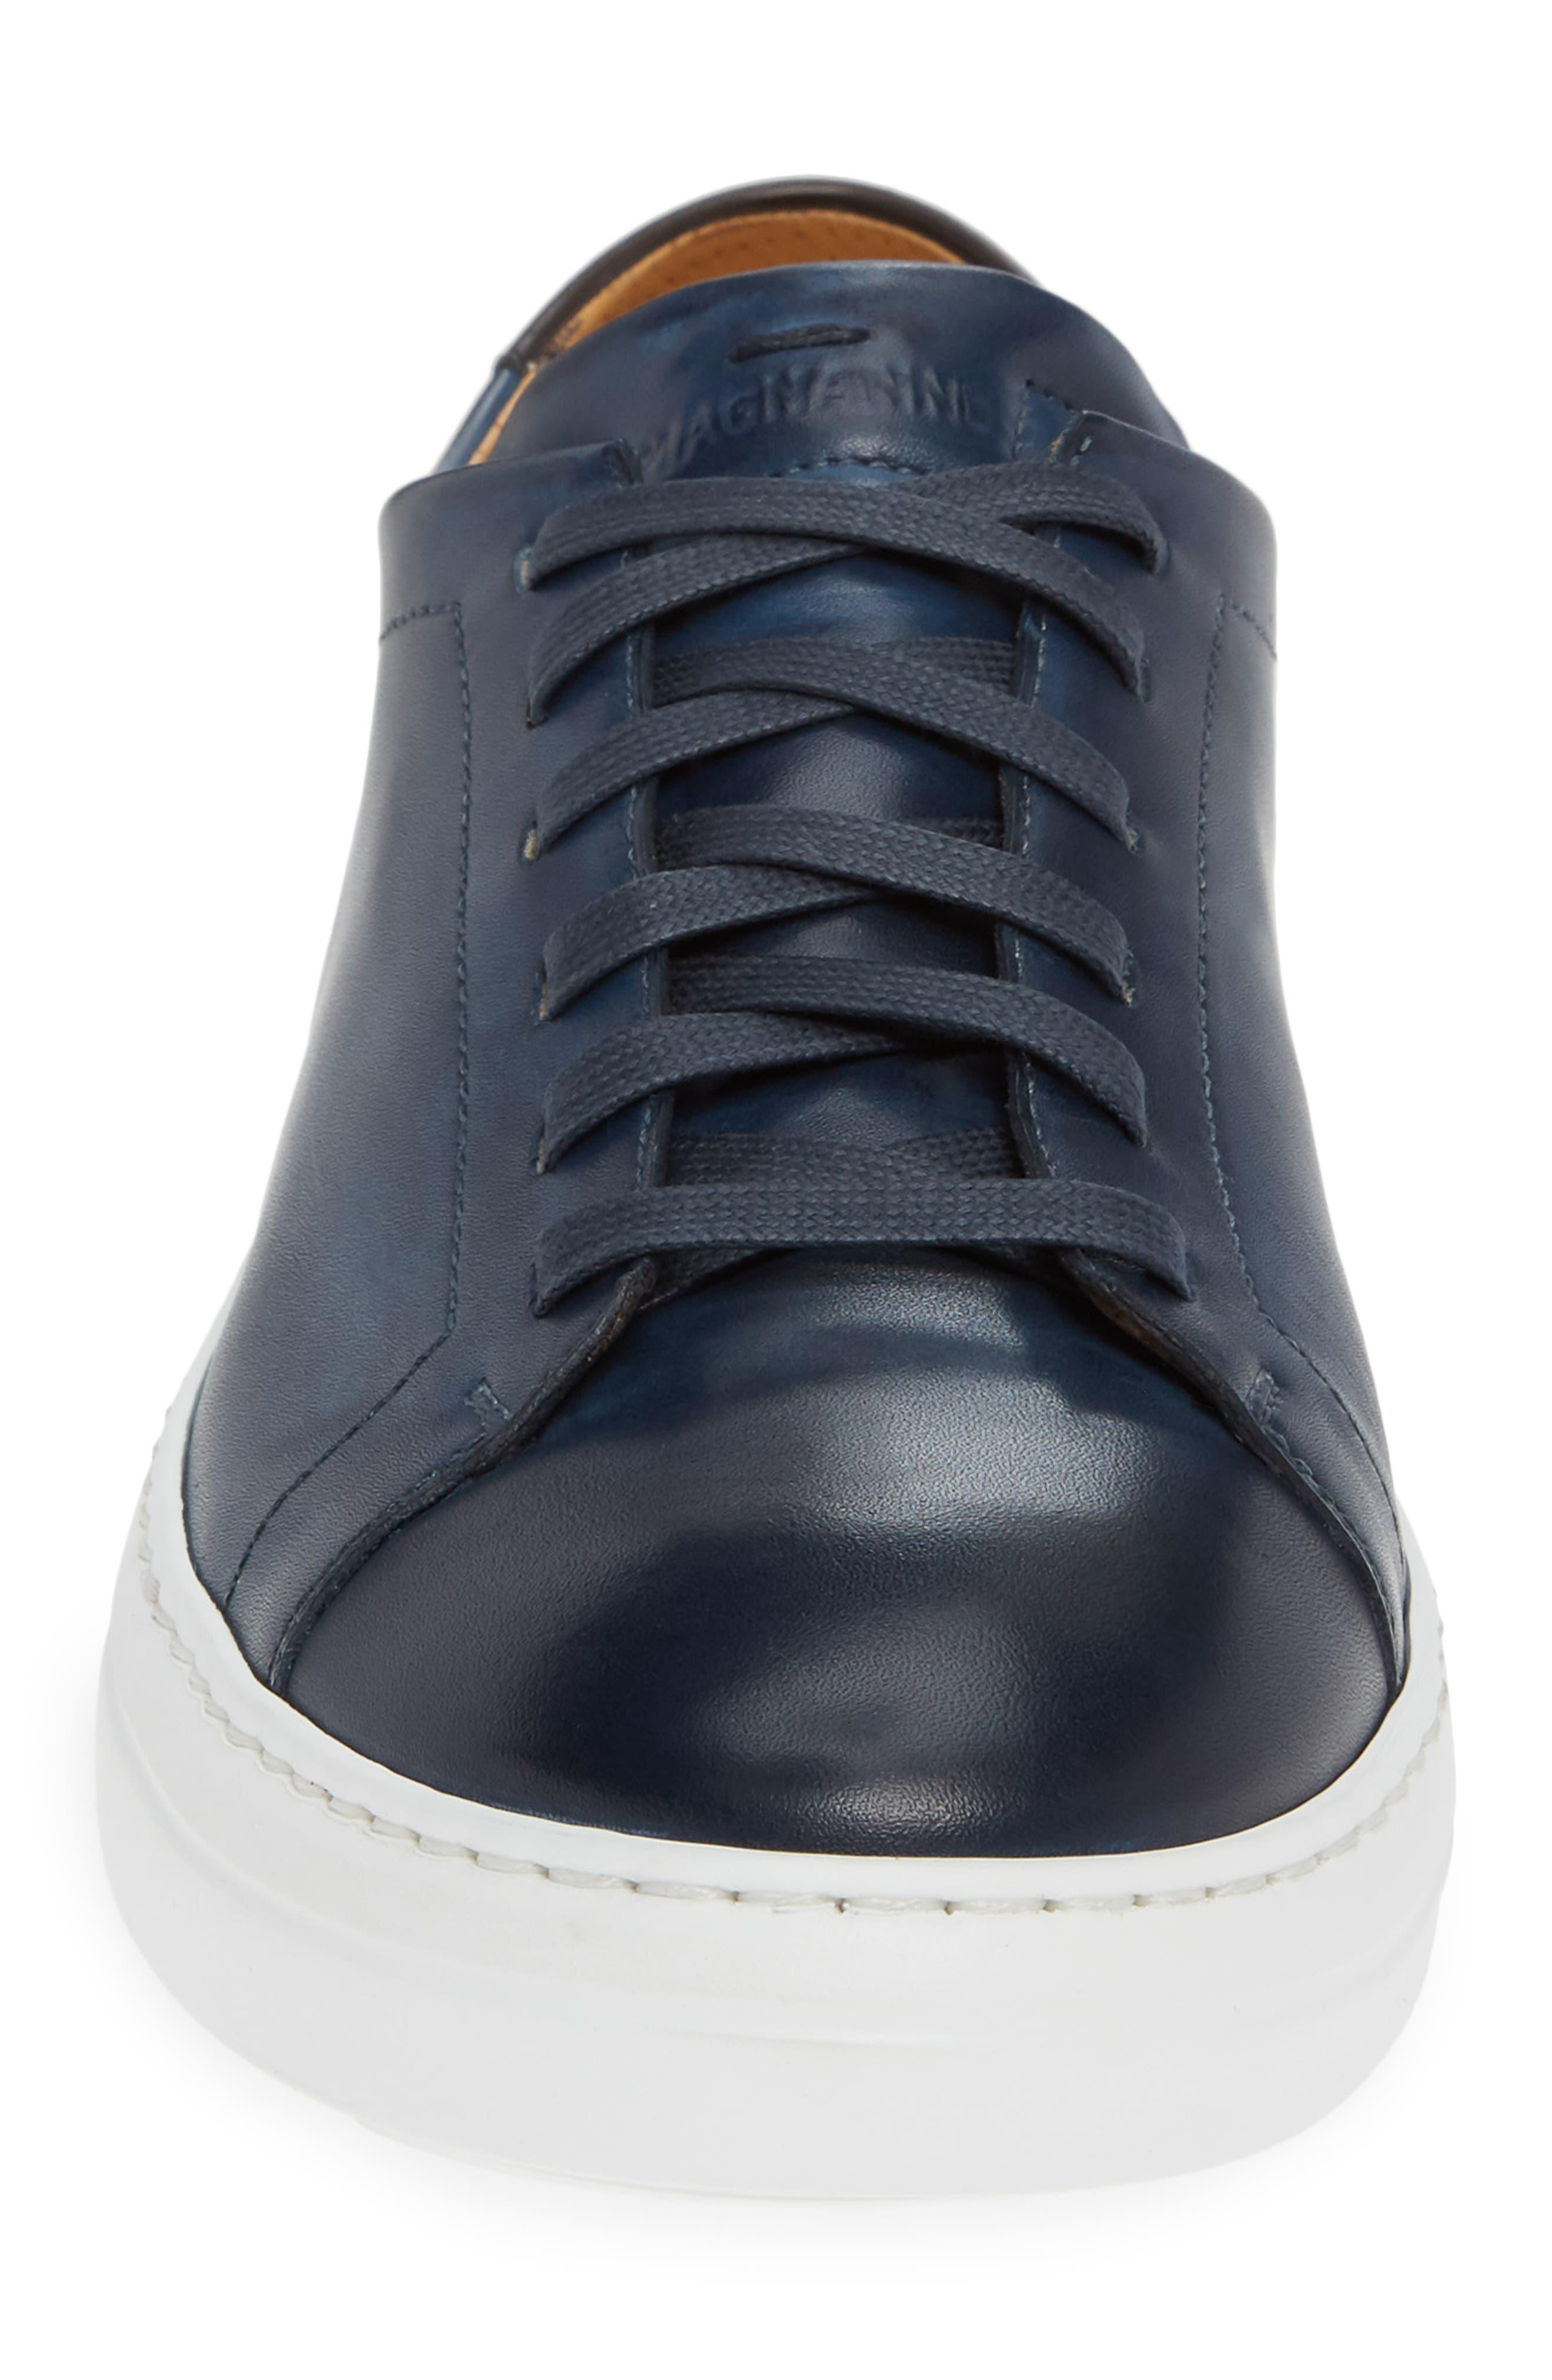 MAGNANNI, Bartolo Sneaker, Alternate thumbnail 4, color, NAVY LEATHER